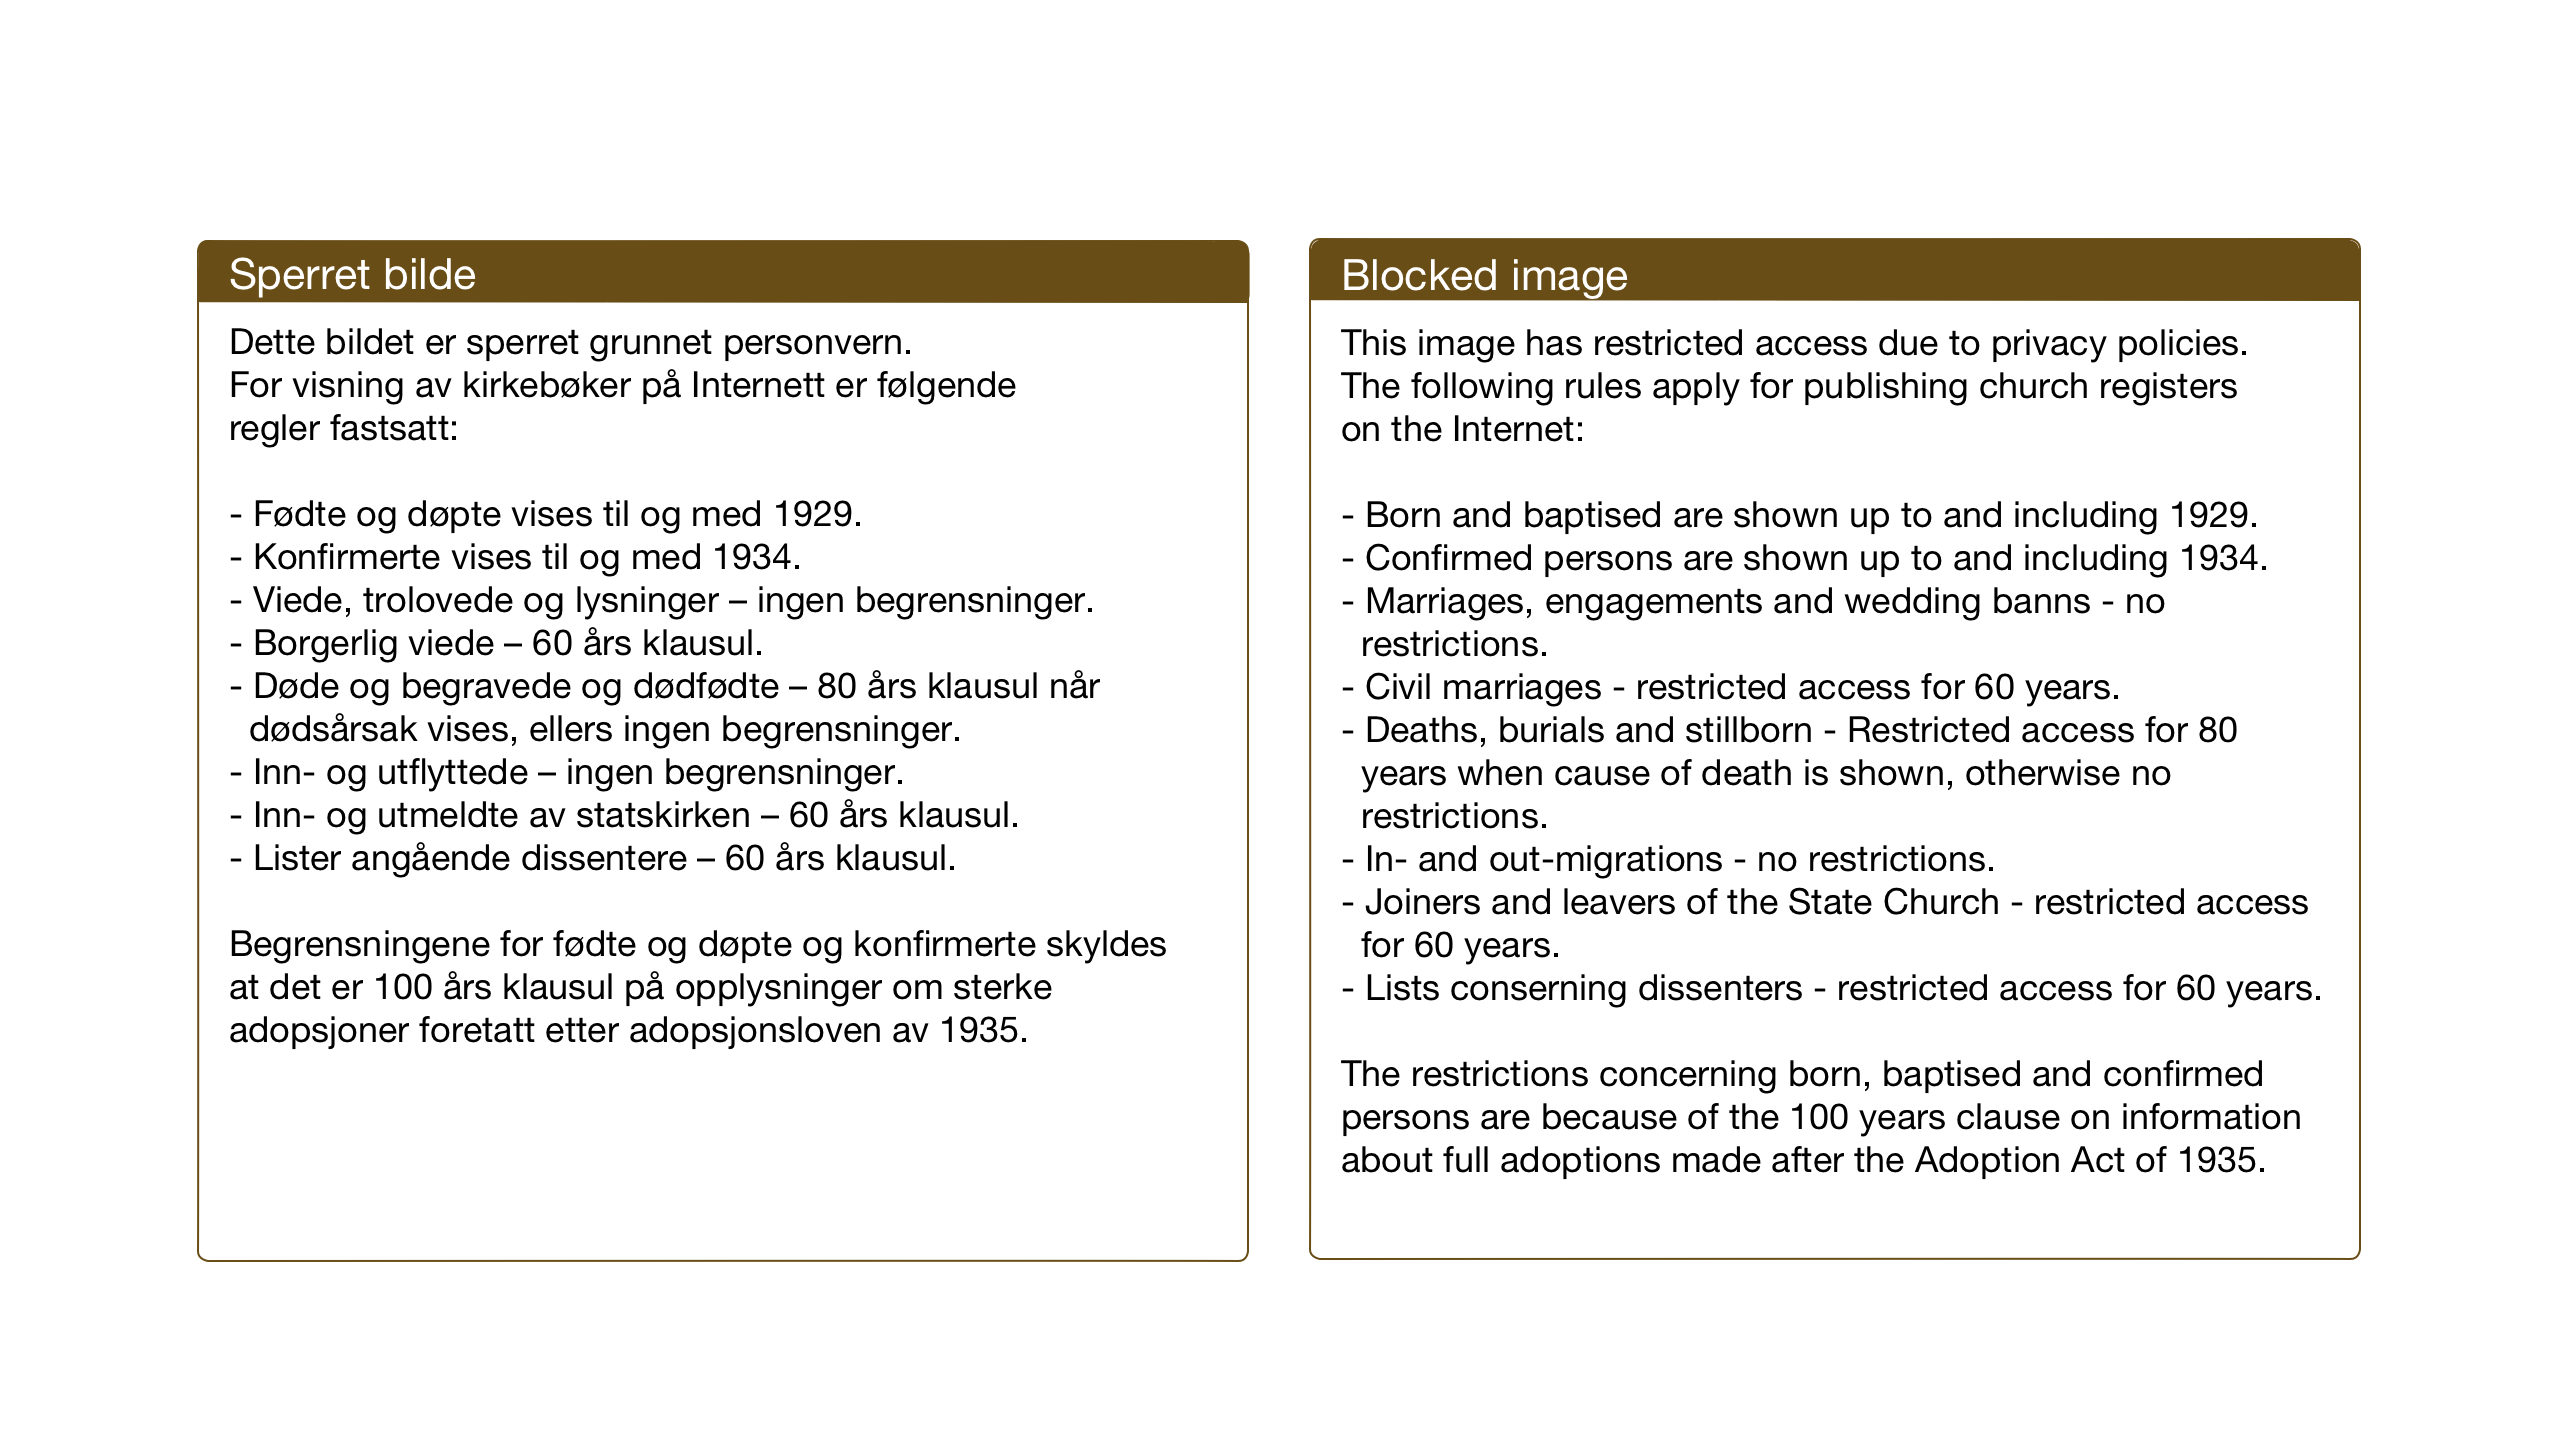 SAB, Domkirken Sokneprestembete, H/Haa: Ministerialbok nr. C 9, 1958-2001, s. 135b-136a